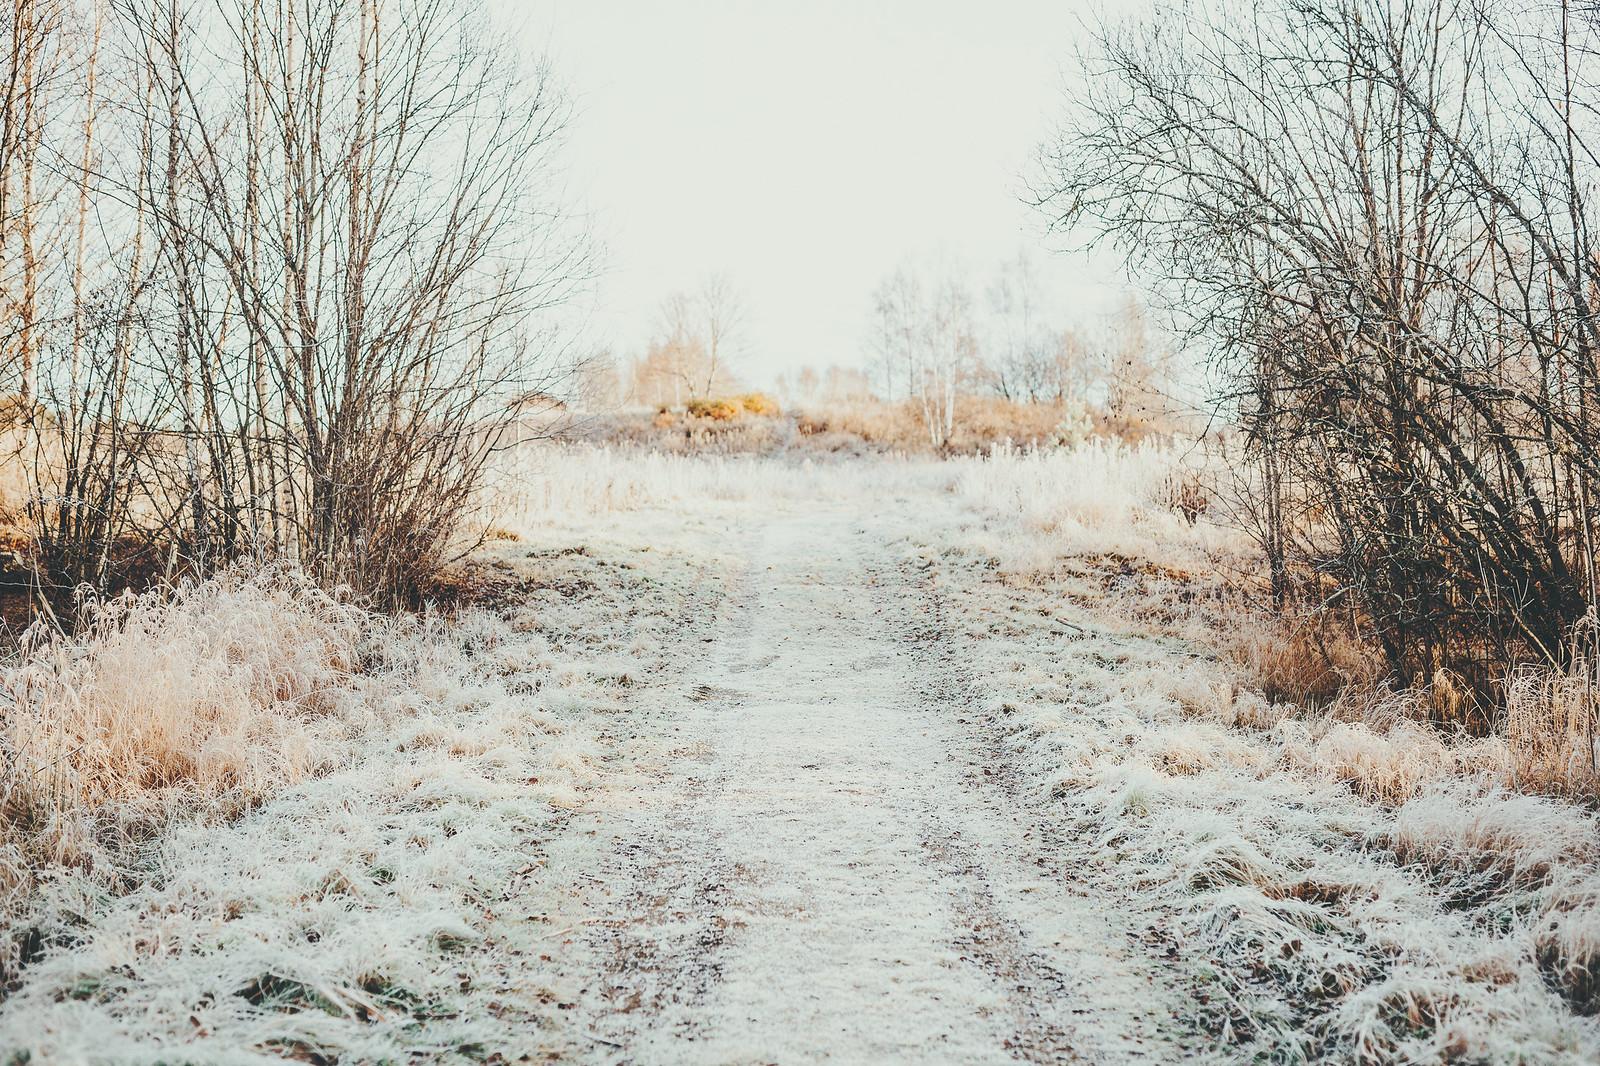 frostig morgonpromenad - karinevelina.se